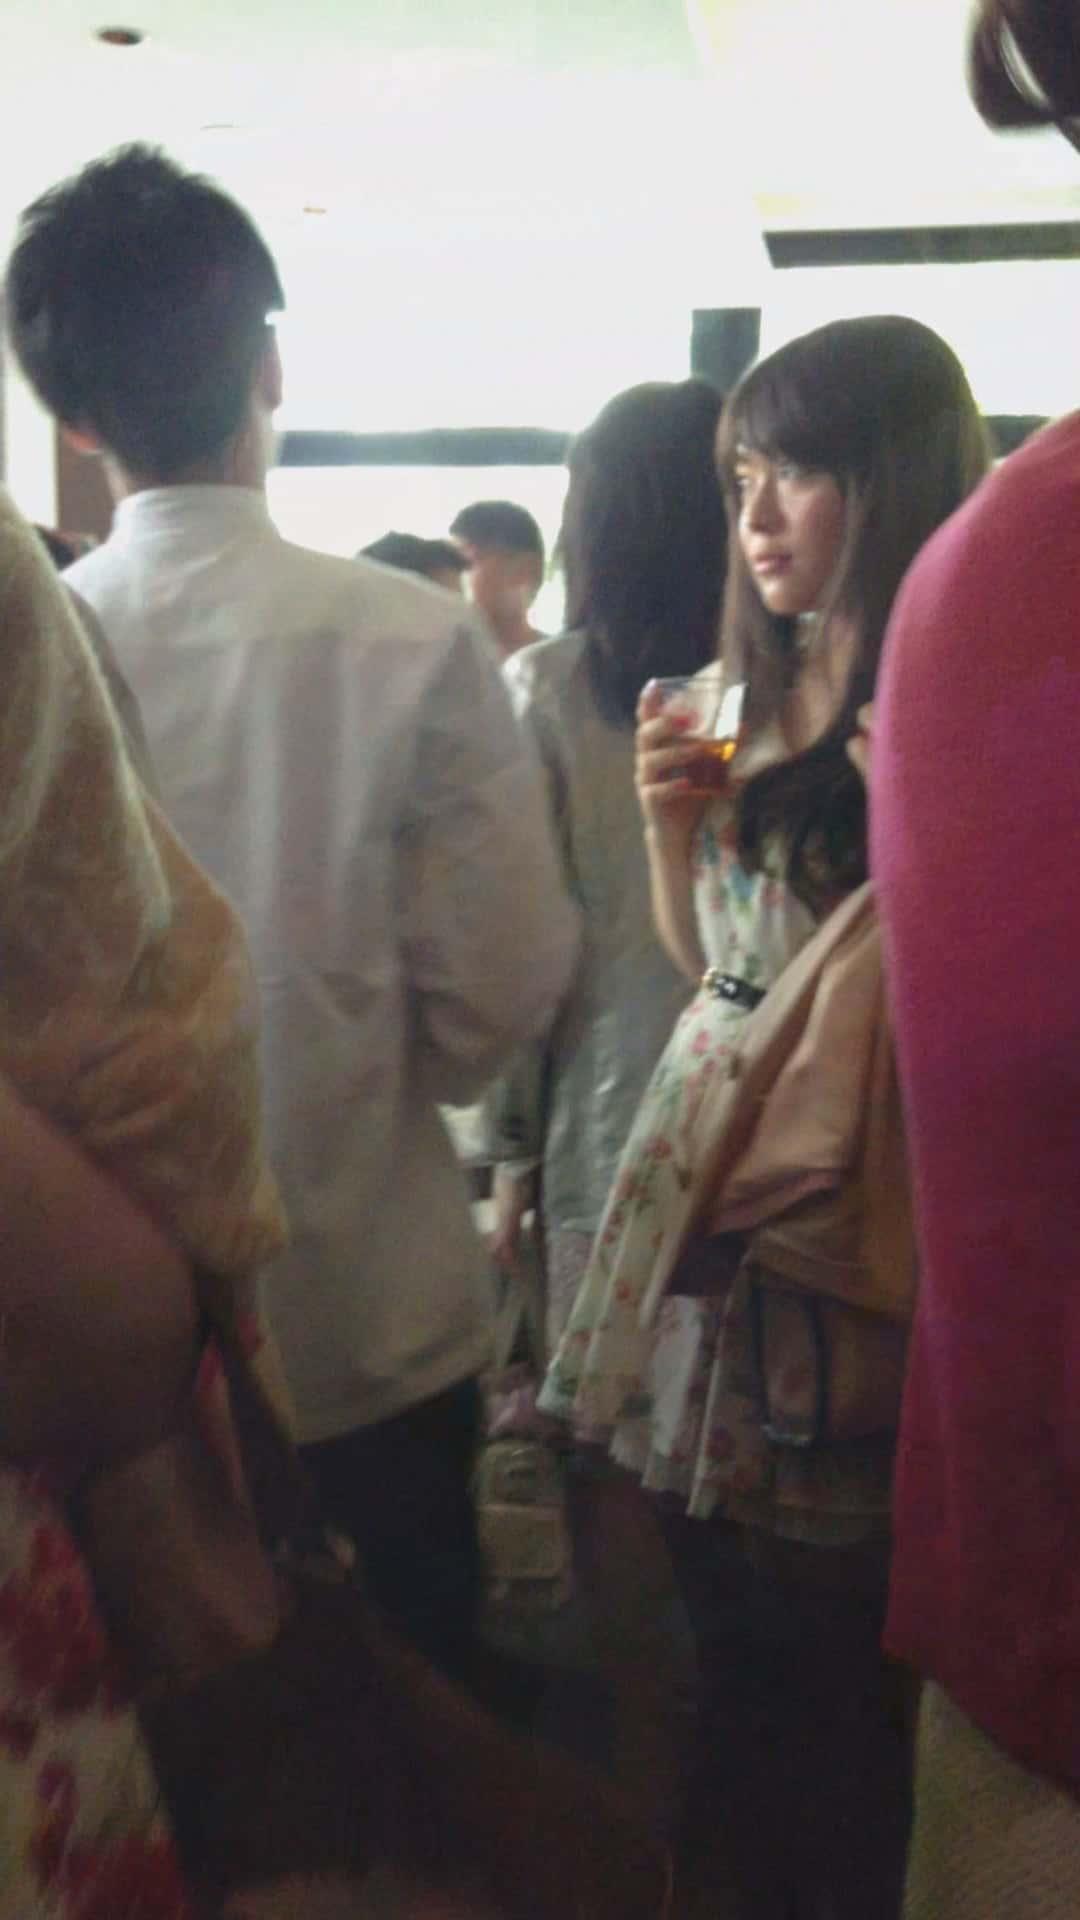 IMG 0069.MOV 1 1 1 0002 - 女性におすすめ年齢別結婚相談所ランキング!